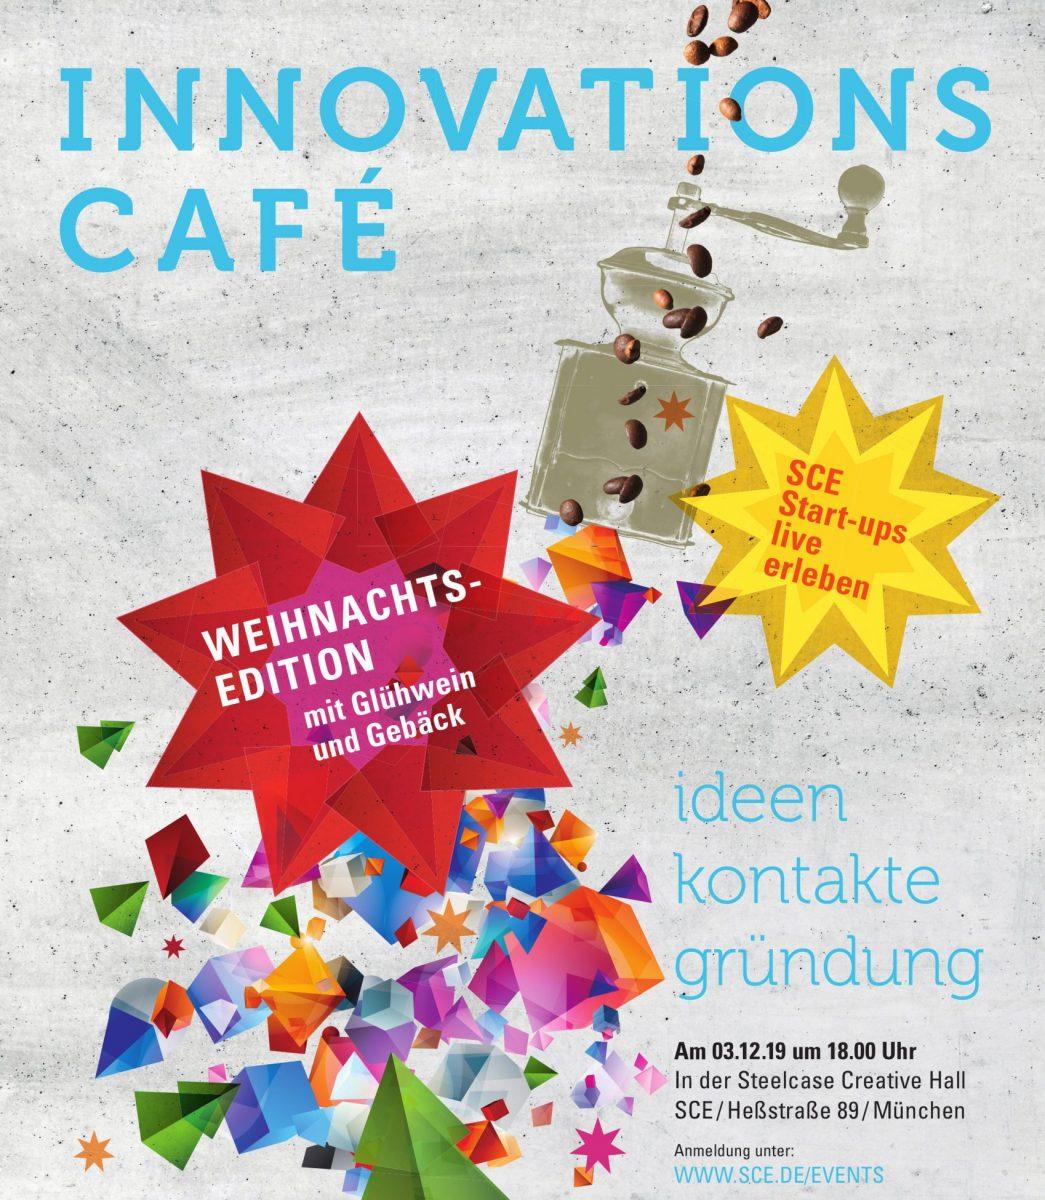 Innovations-Café: Weihnachtsedition - SCE Startups live erleben